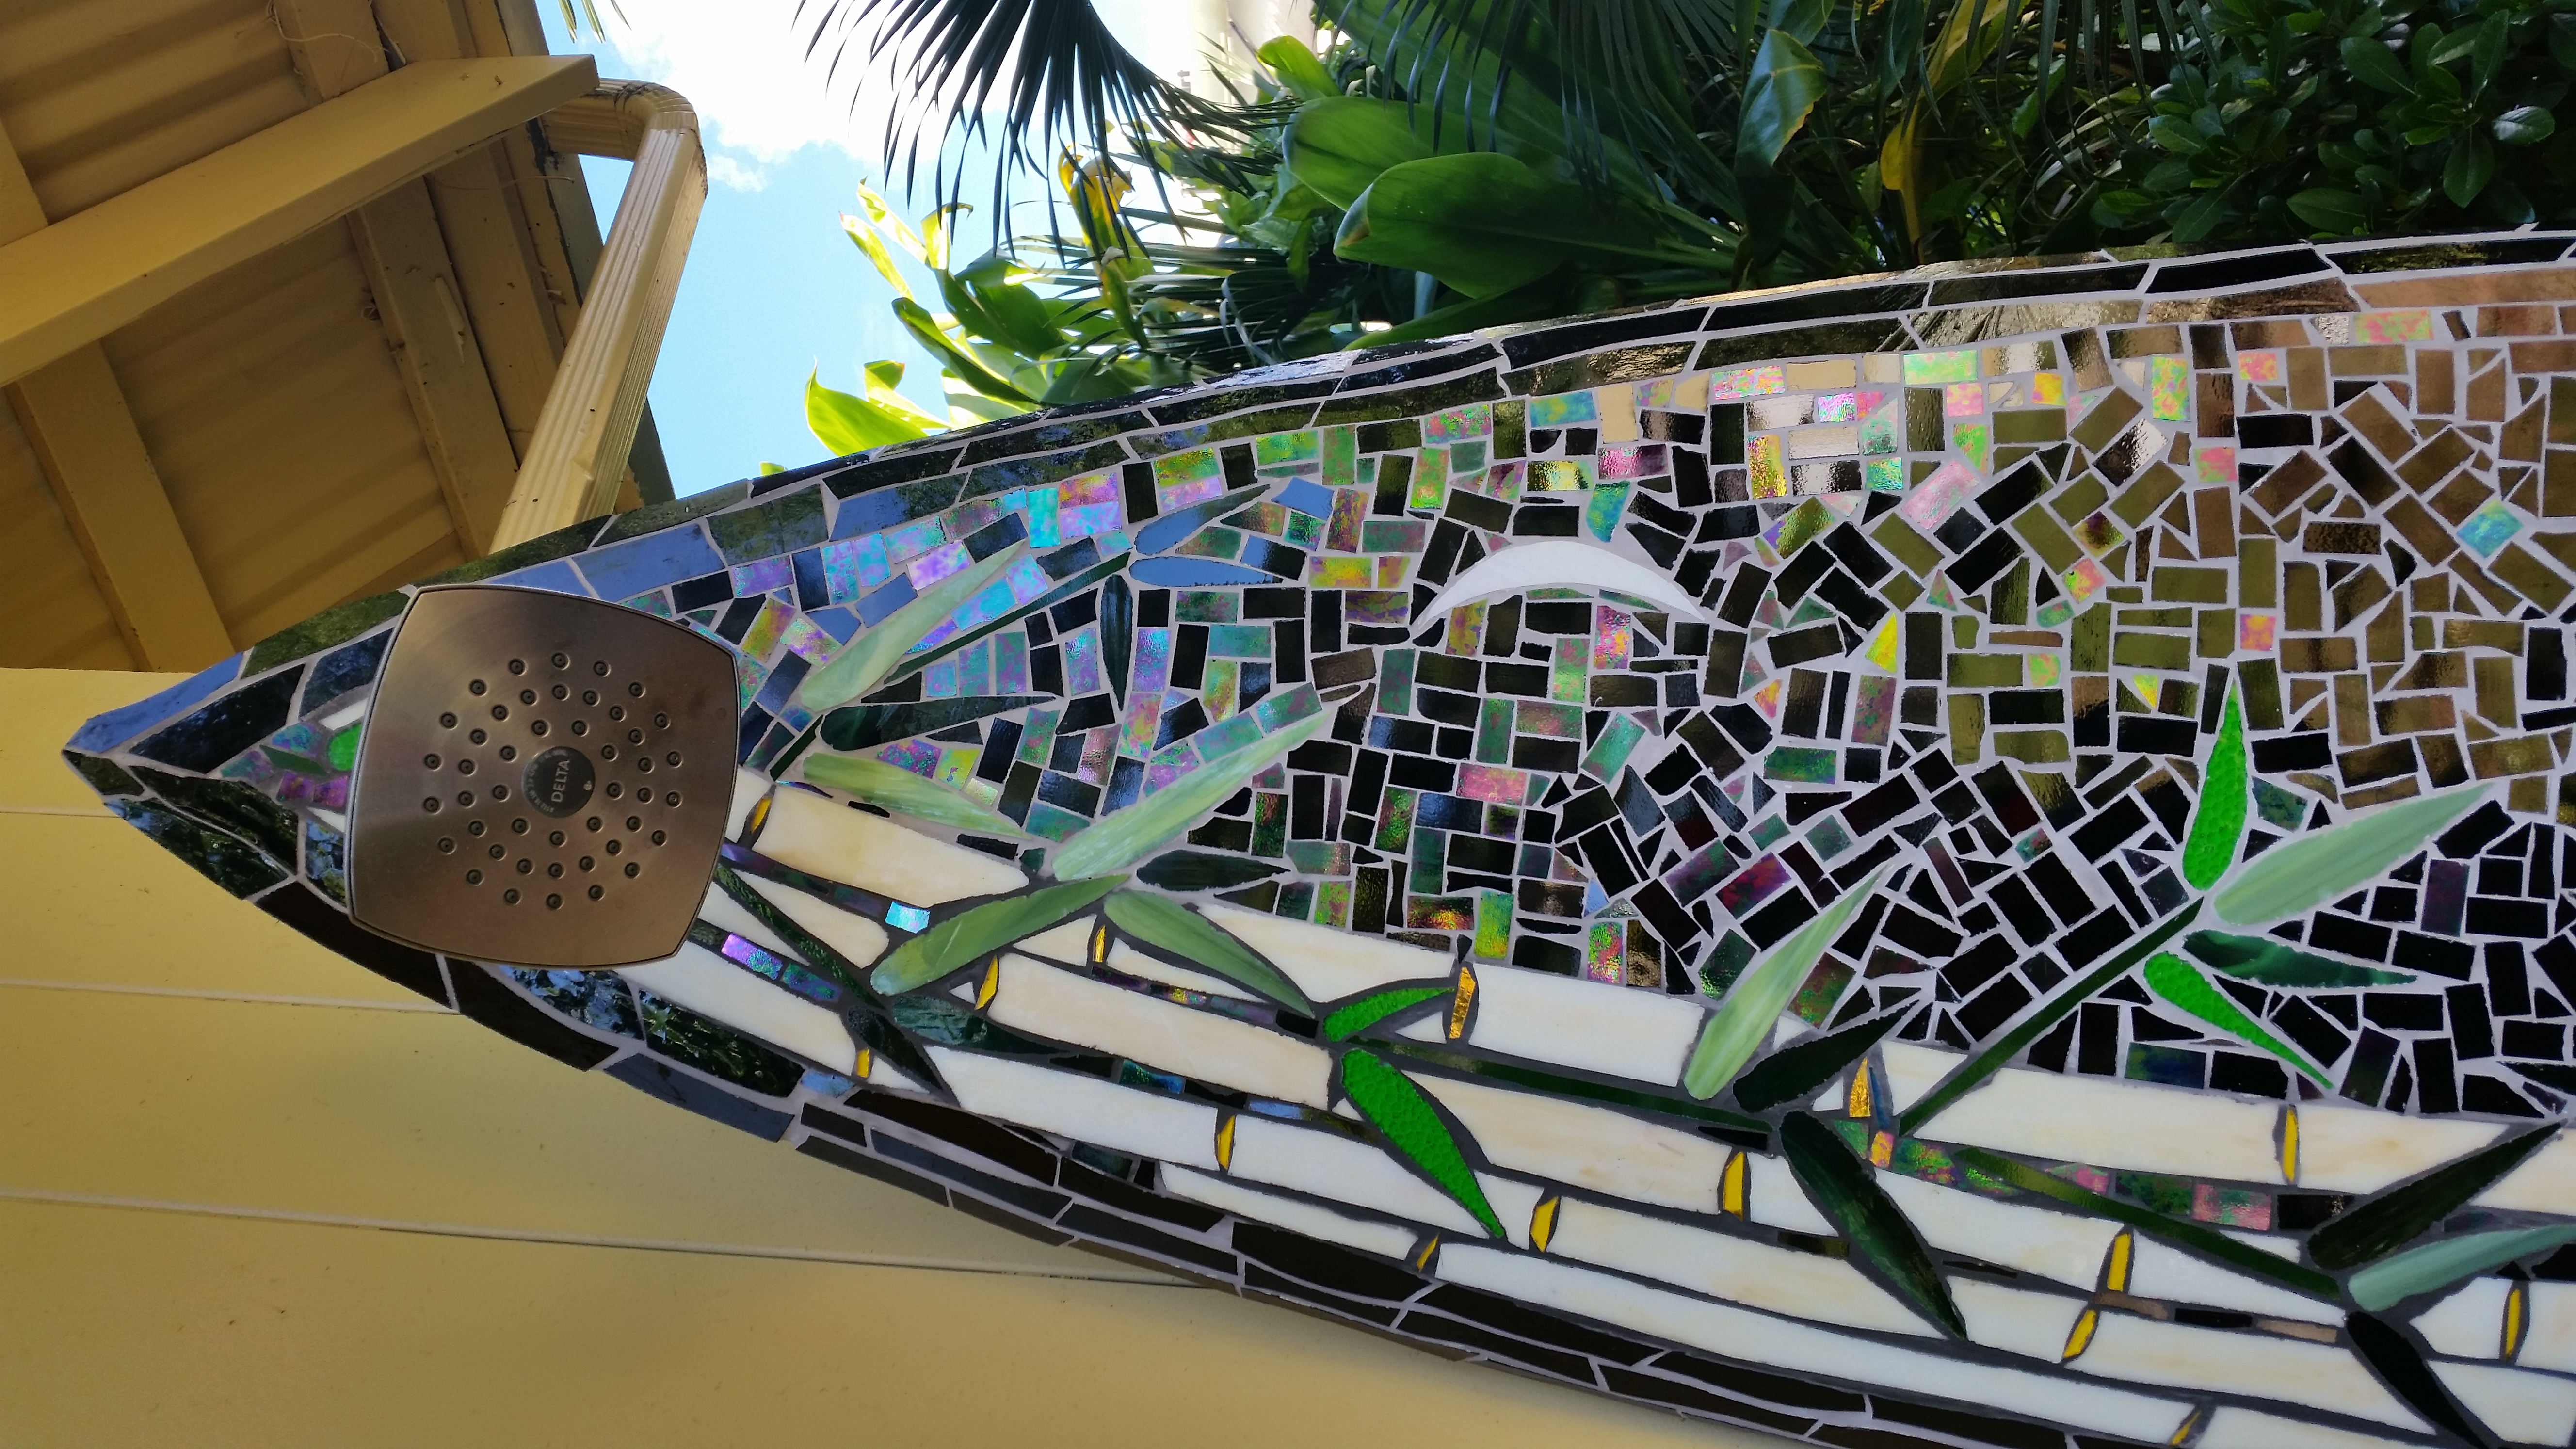 Shower Head On Mosaic Surfboard